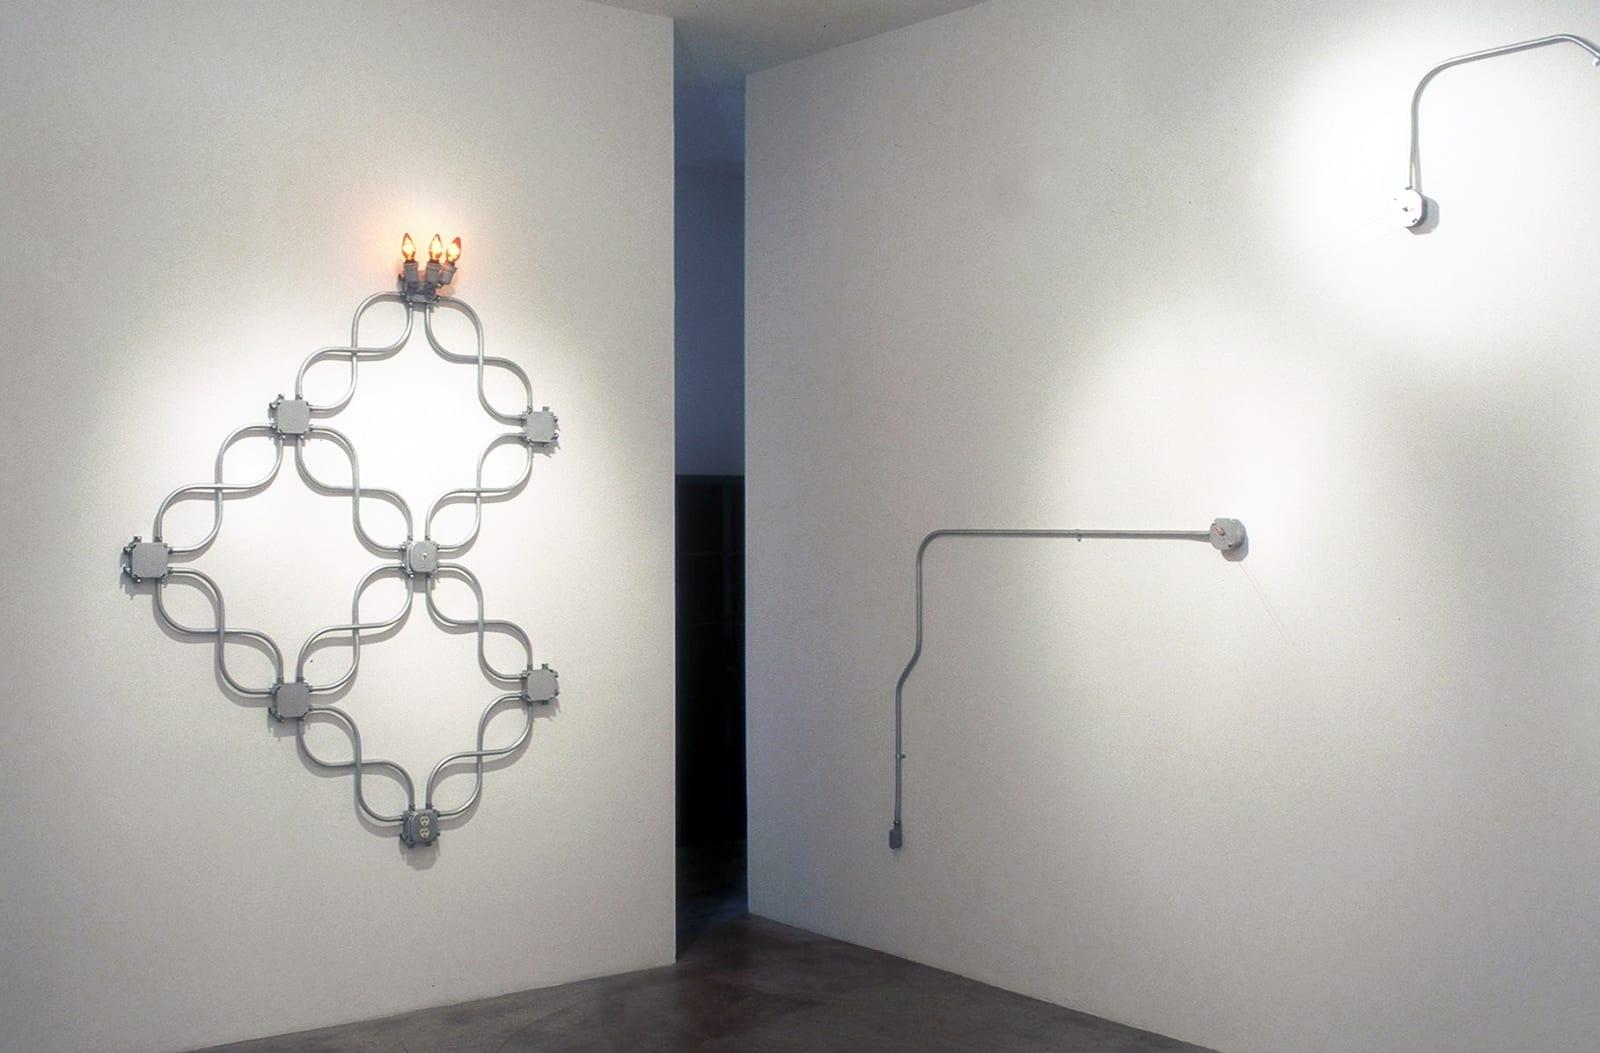 Roman De Salvo   Recent Work with Electrical Conduit